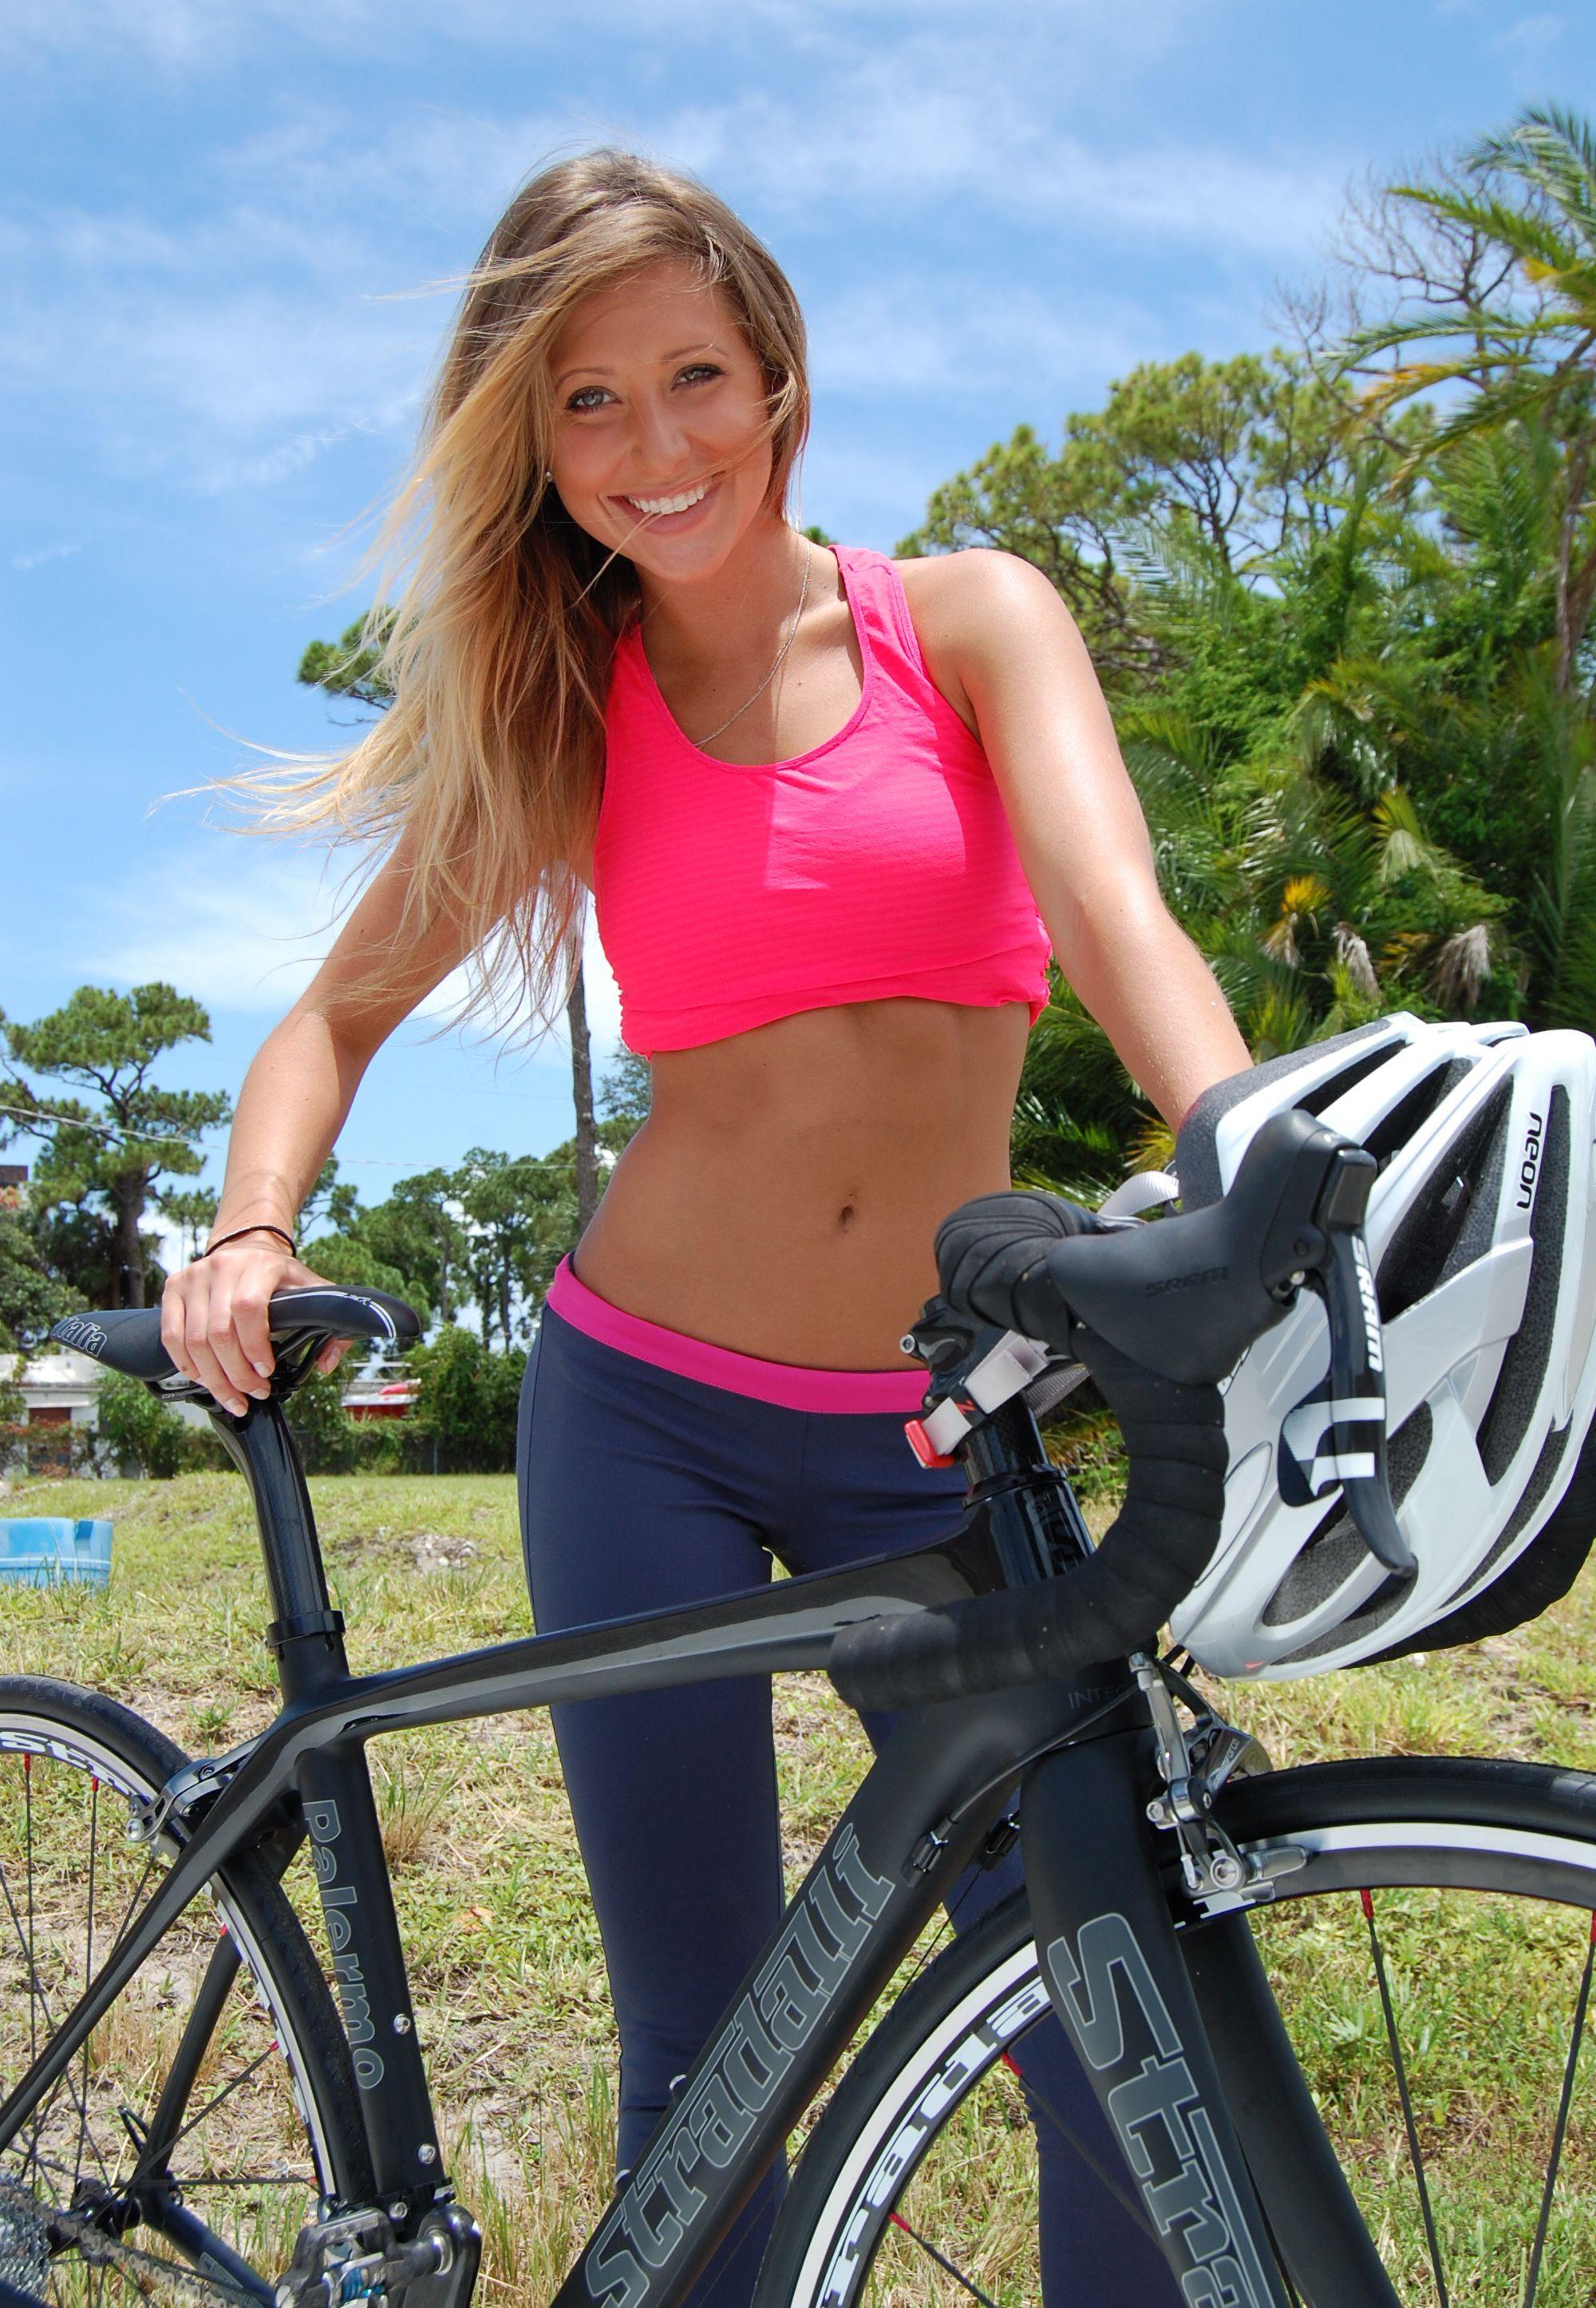 hot nude girls clips auf dem fahrrad